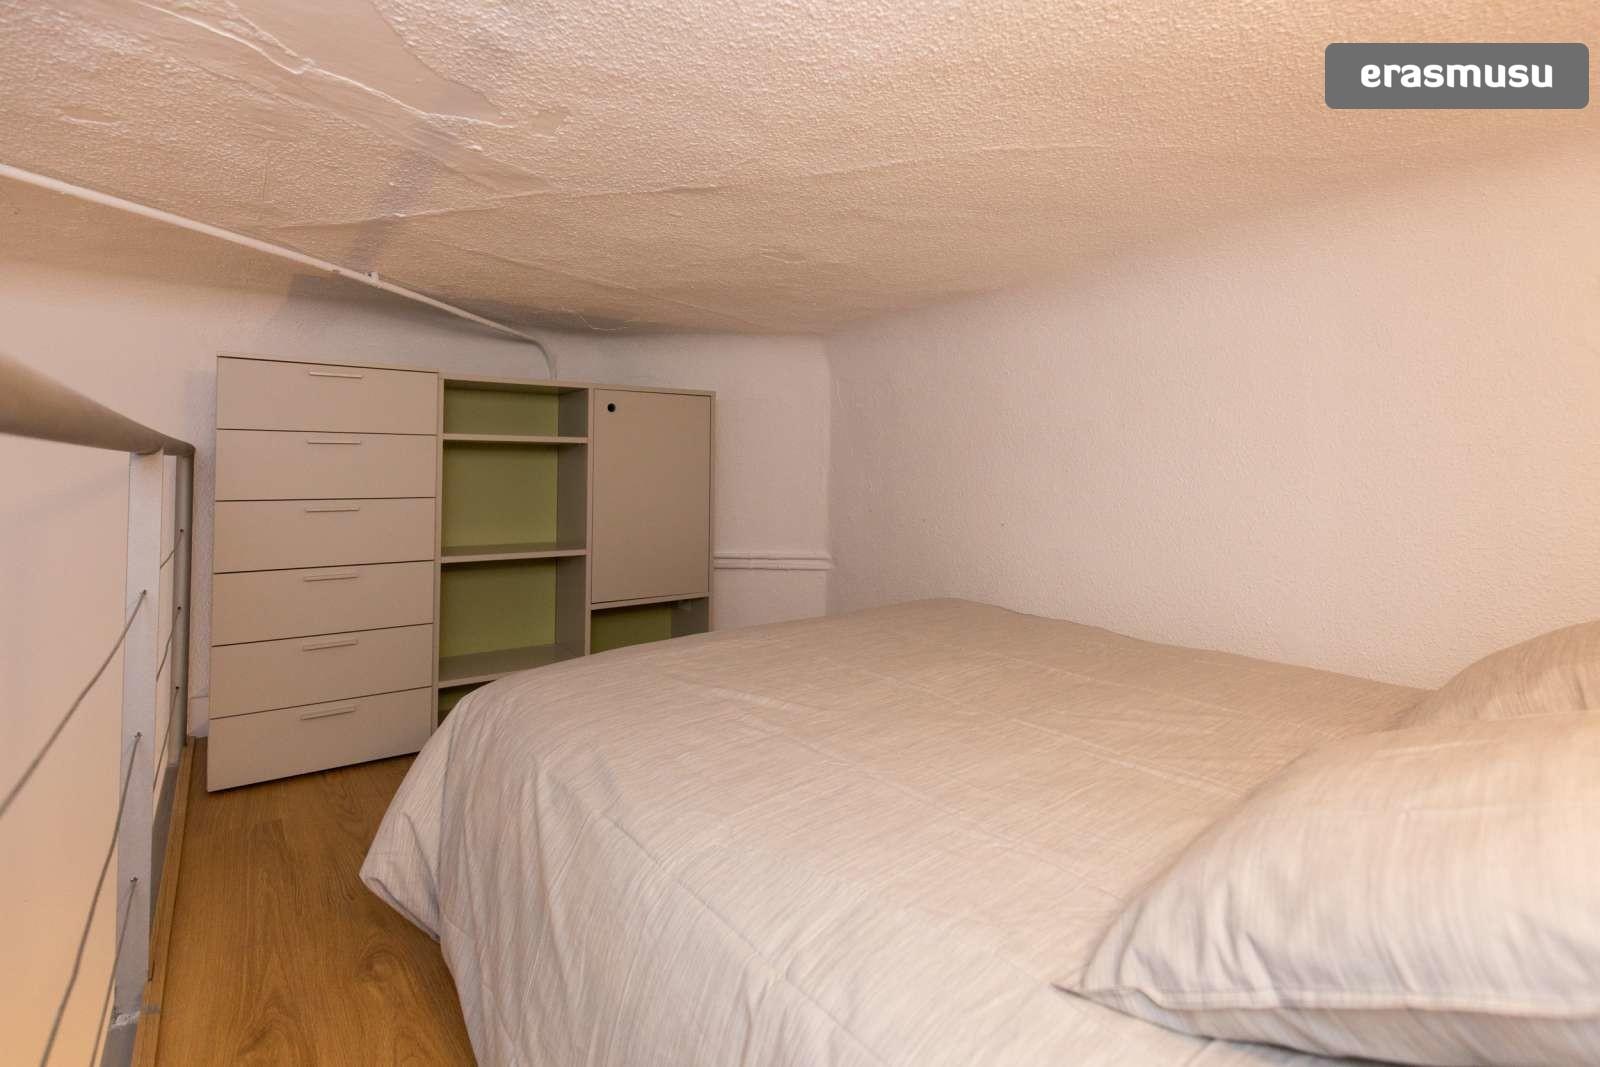 colourful-studio-apartment-rent-city-centre-07bd1b6e9f2acf45a60b